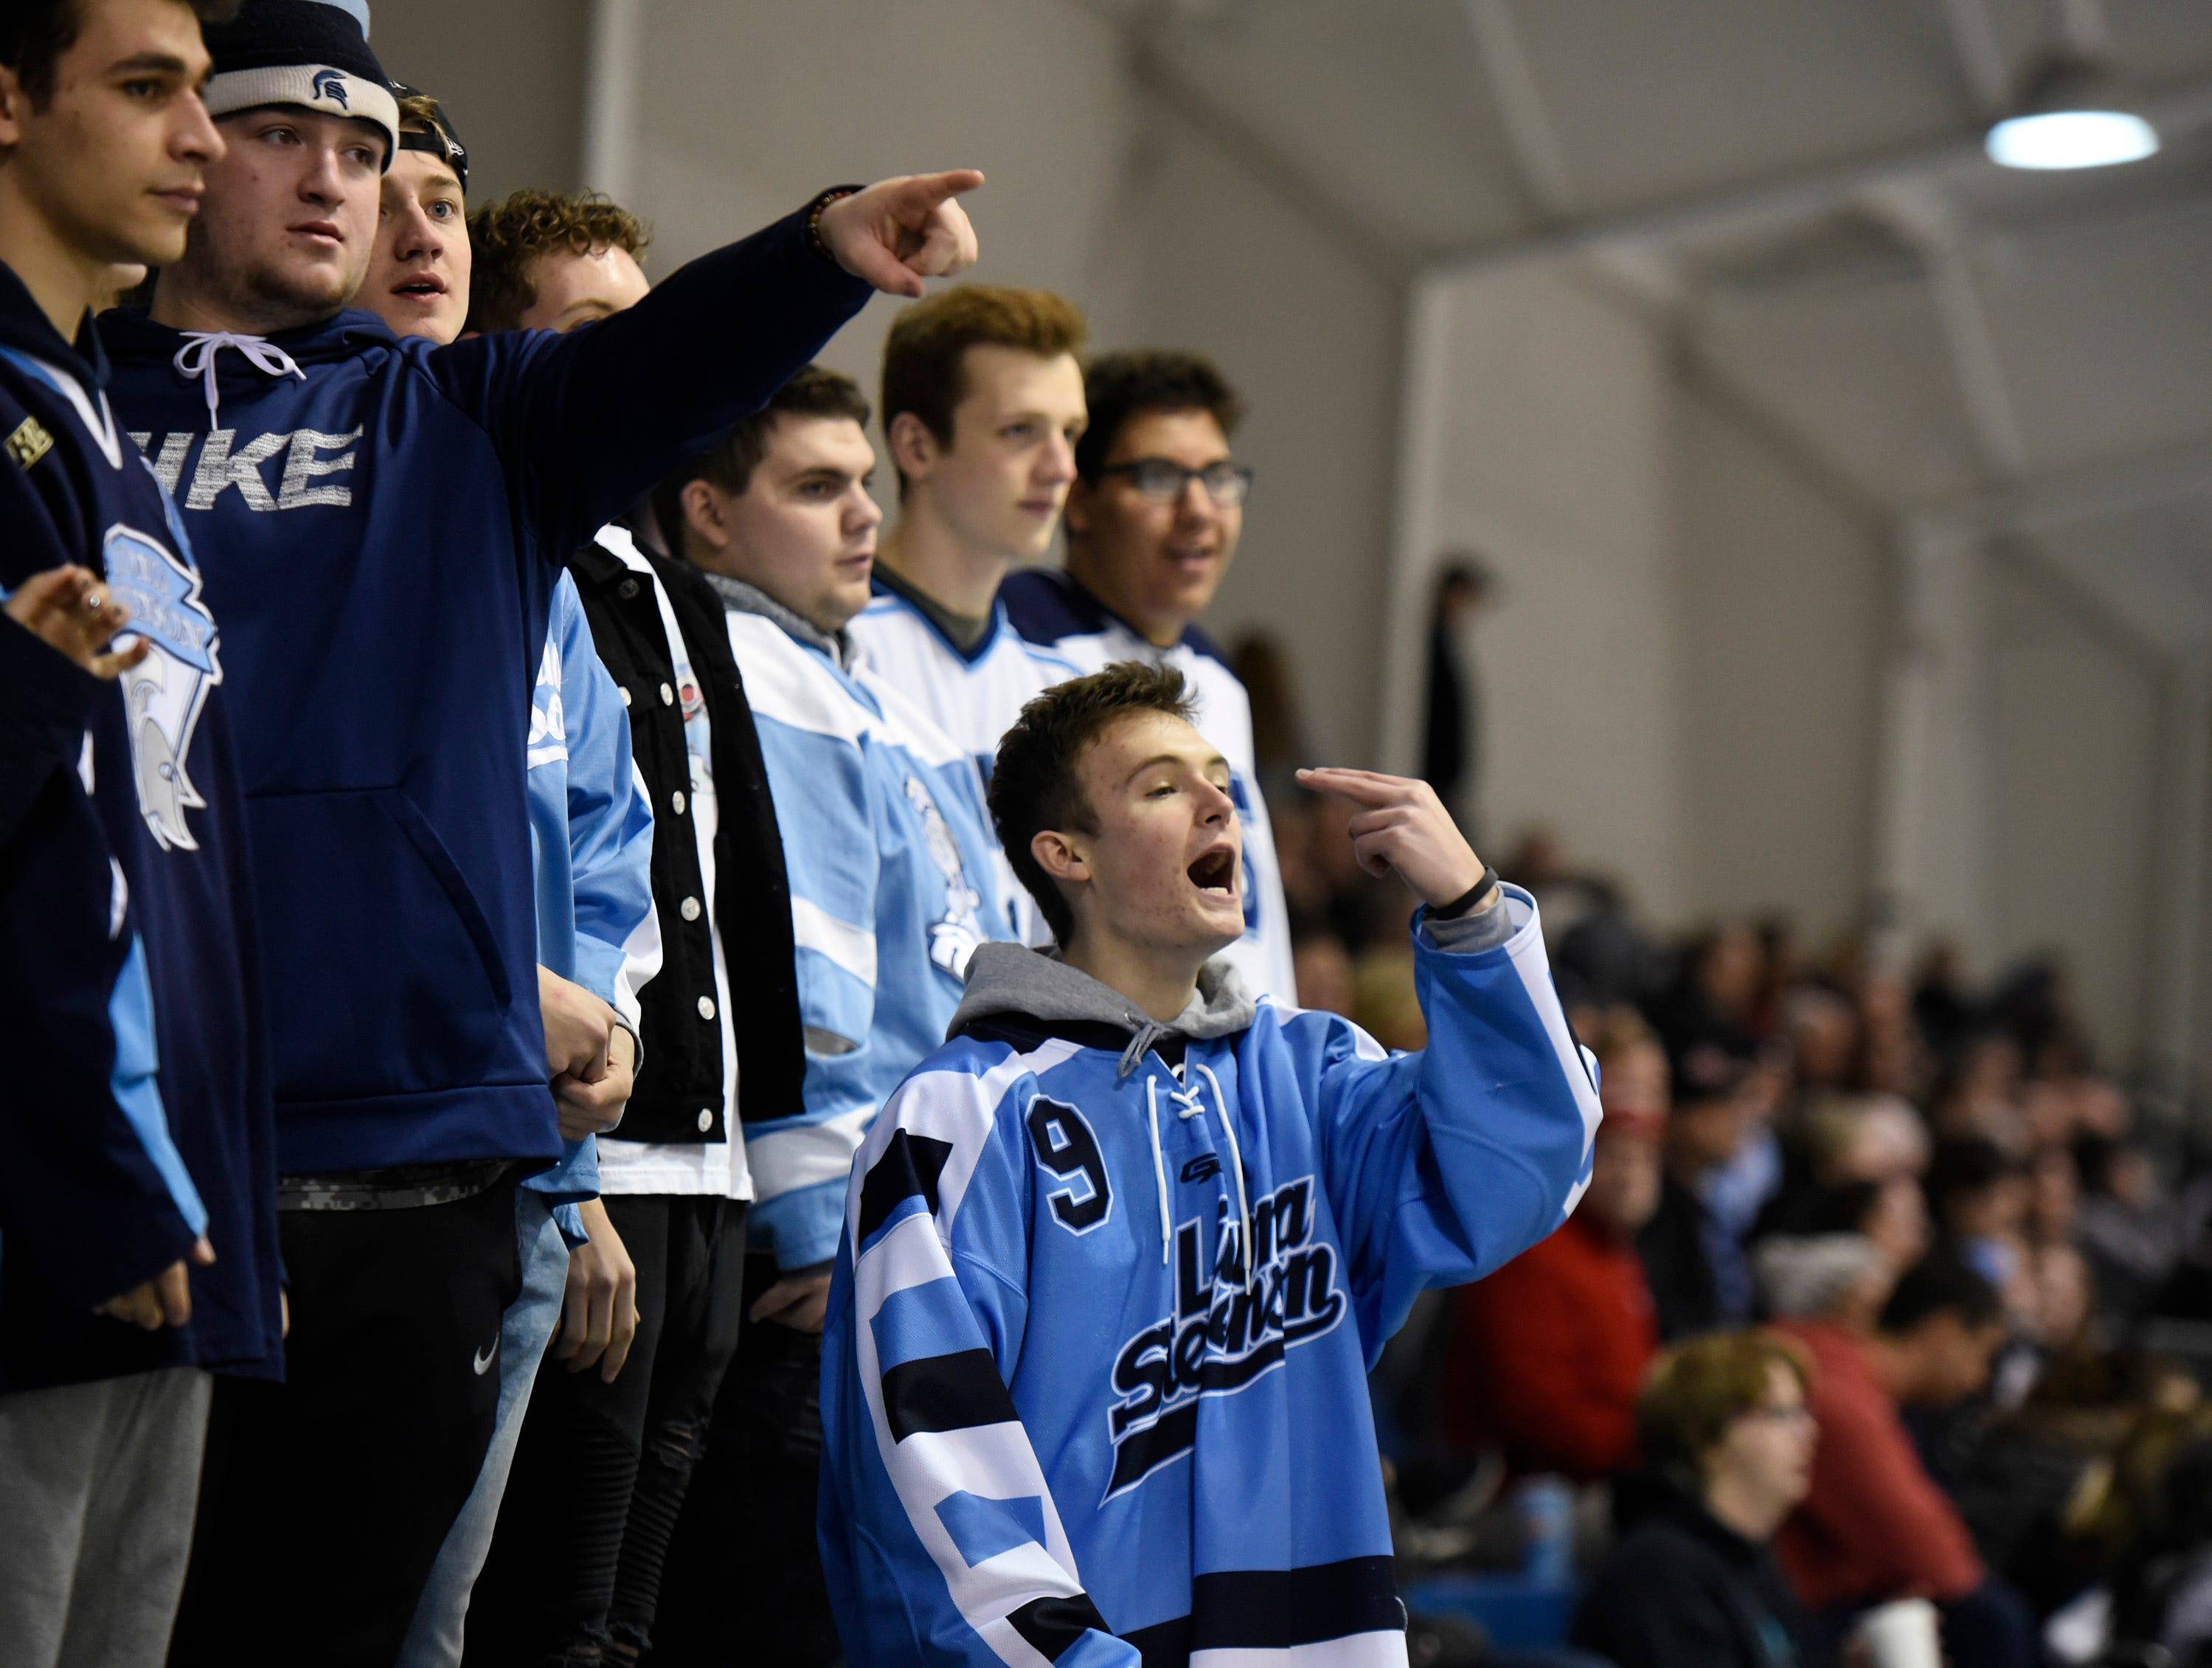 Stevenson student body section during game at Eddie Edgar Arena Jan. 4, 2019.